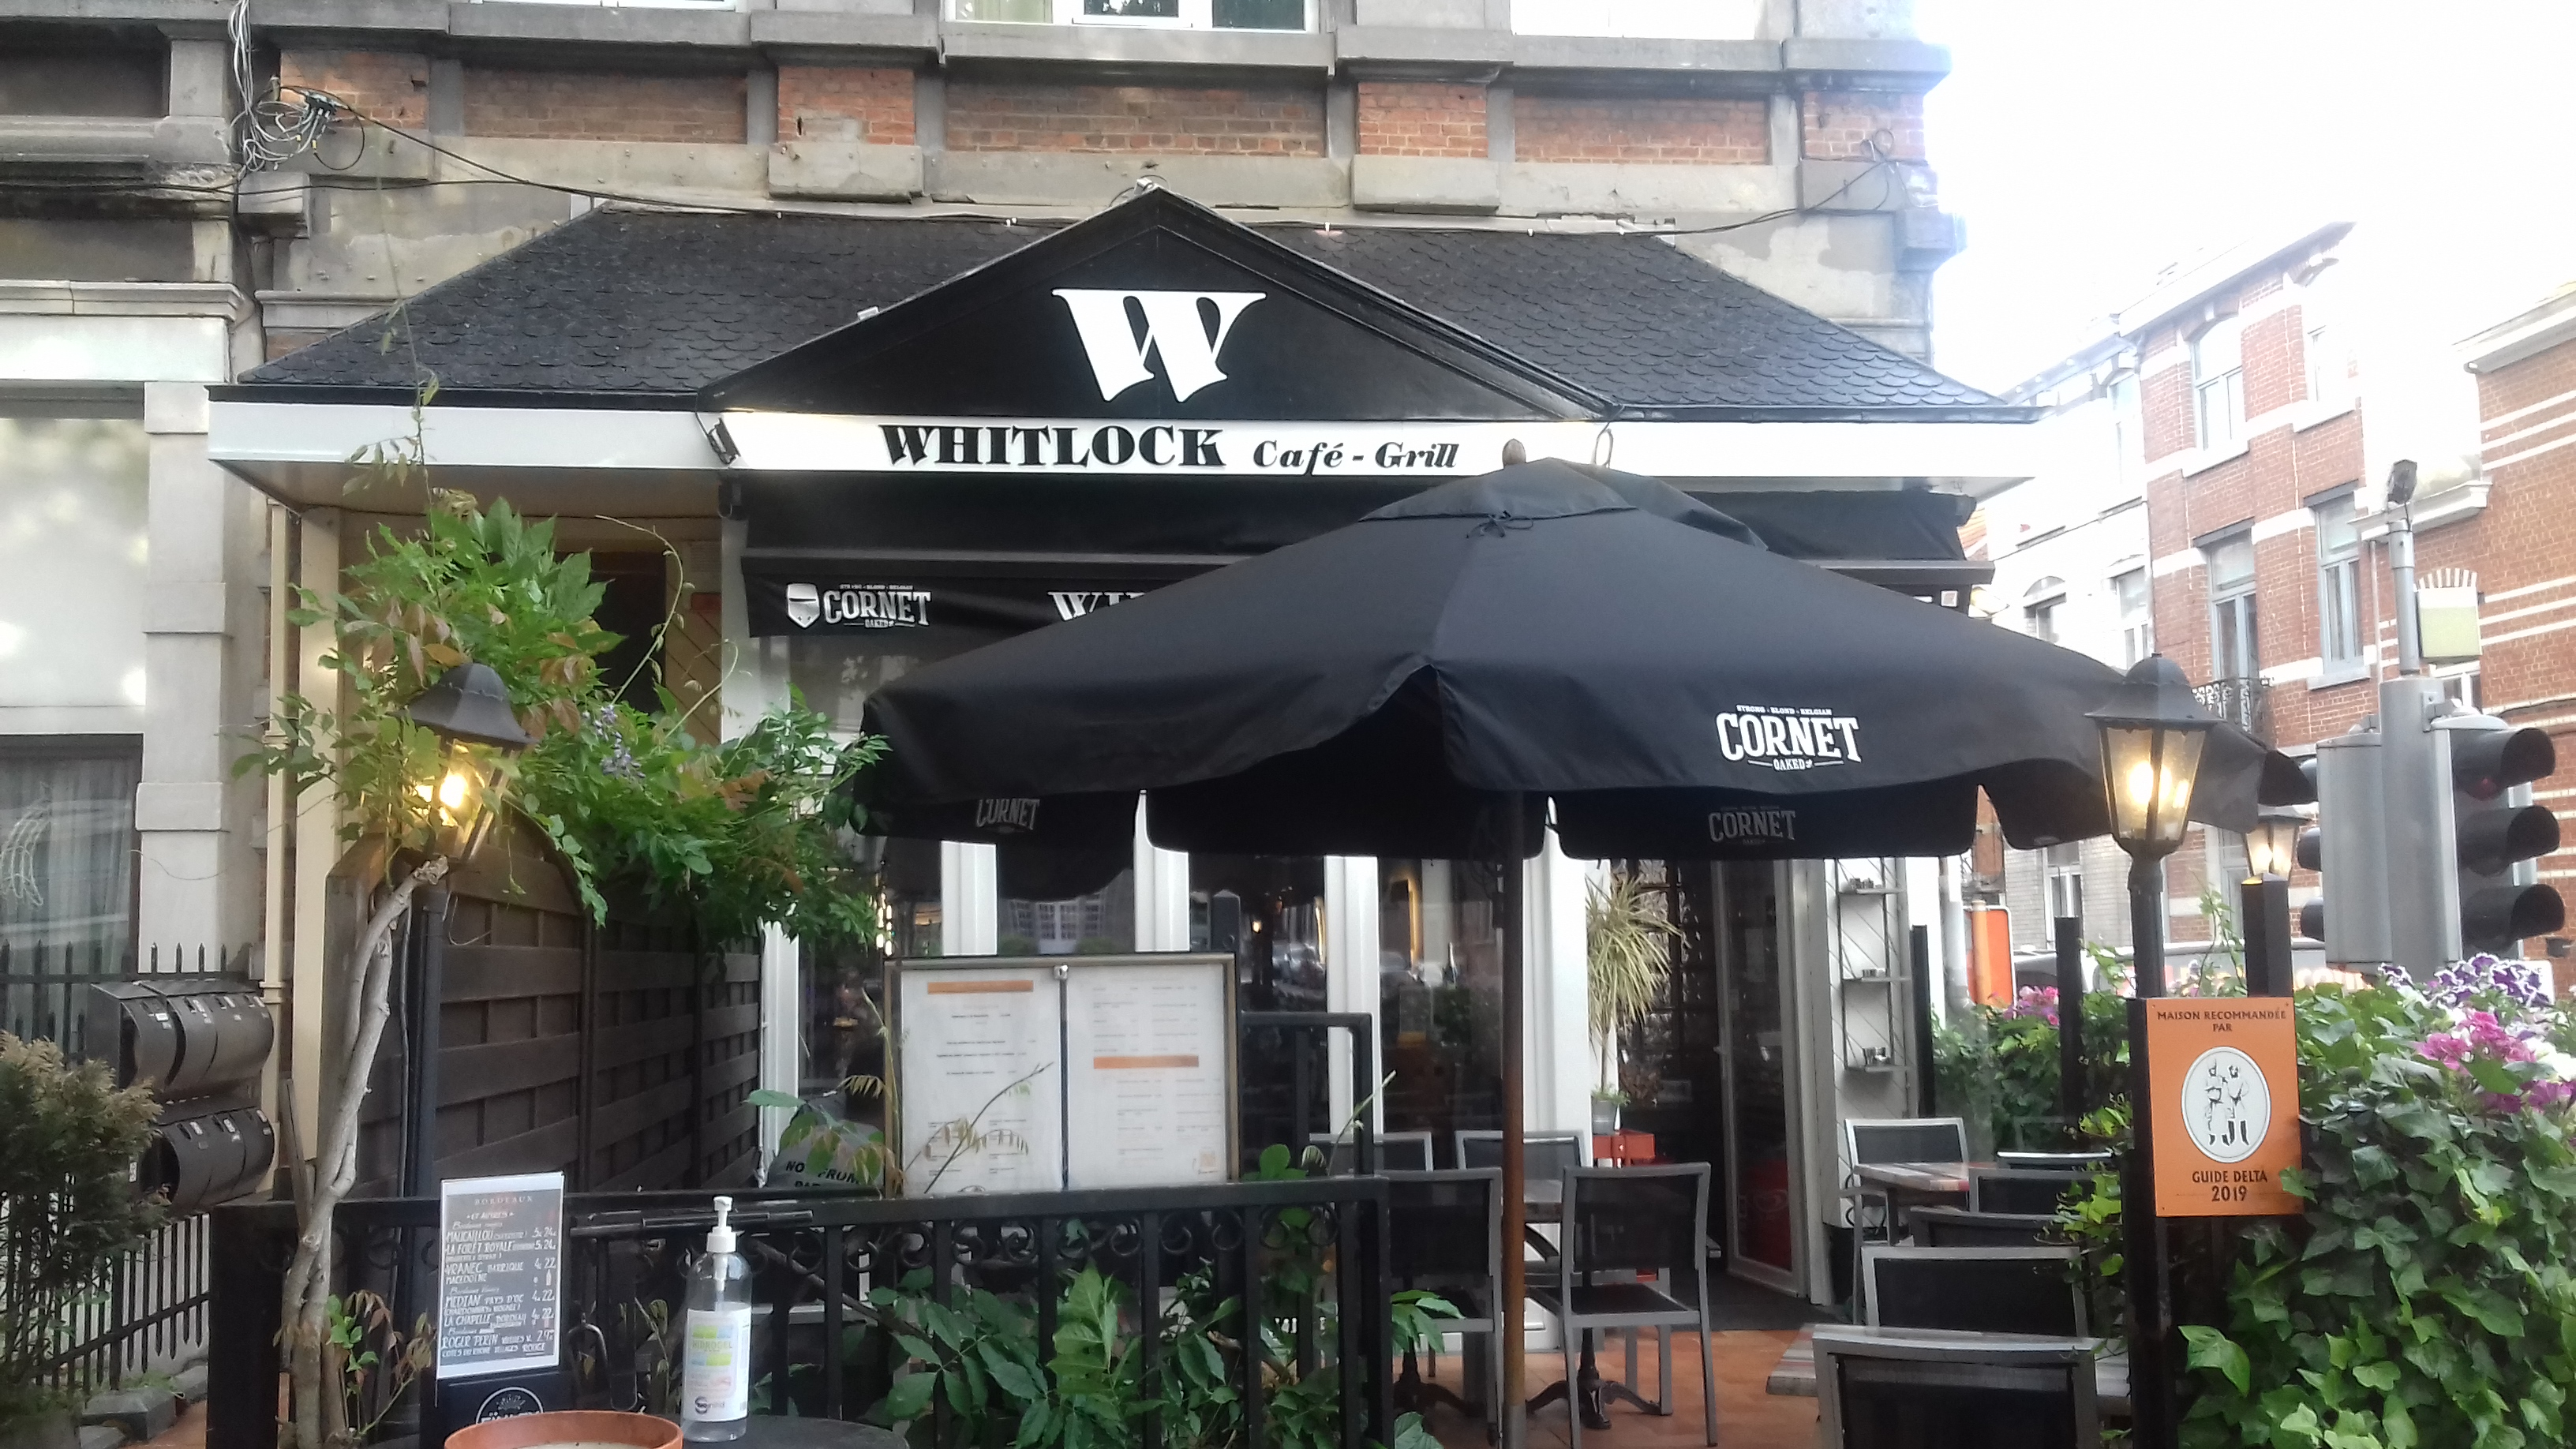 Whitlock Café Grill